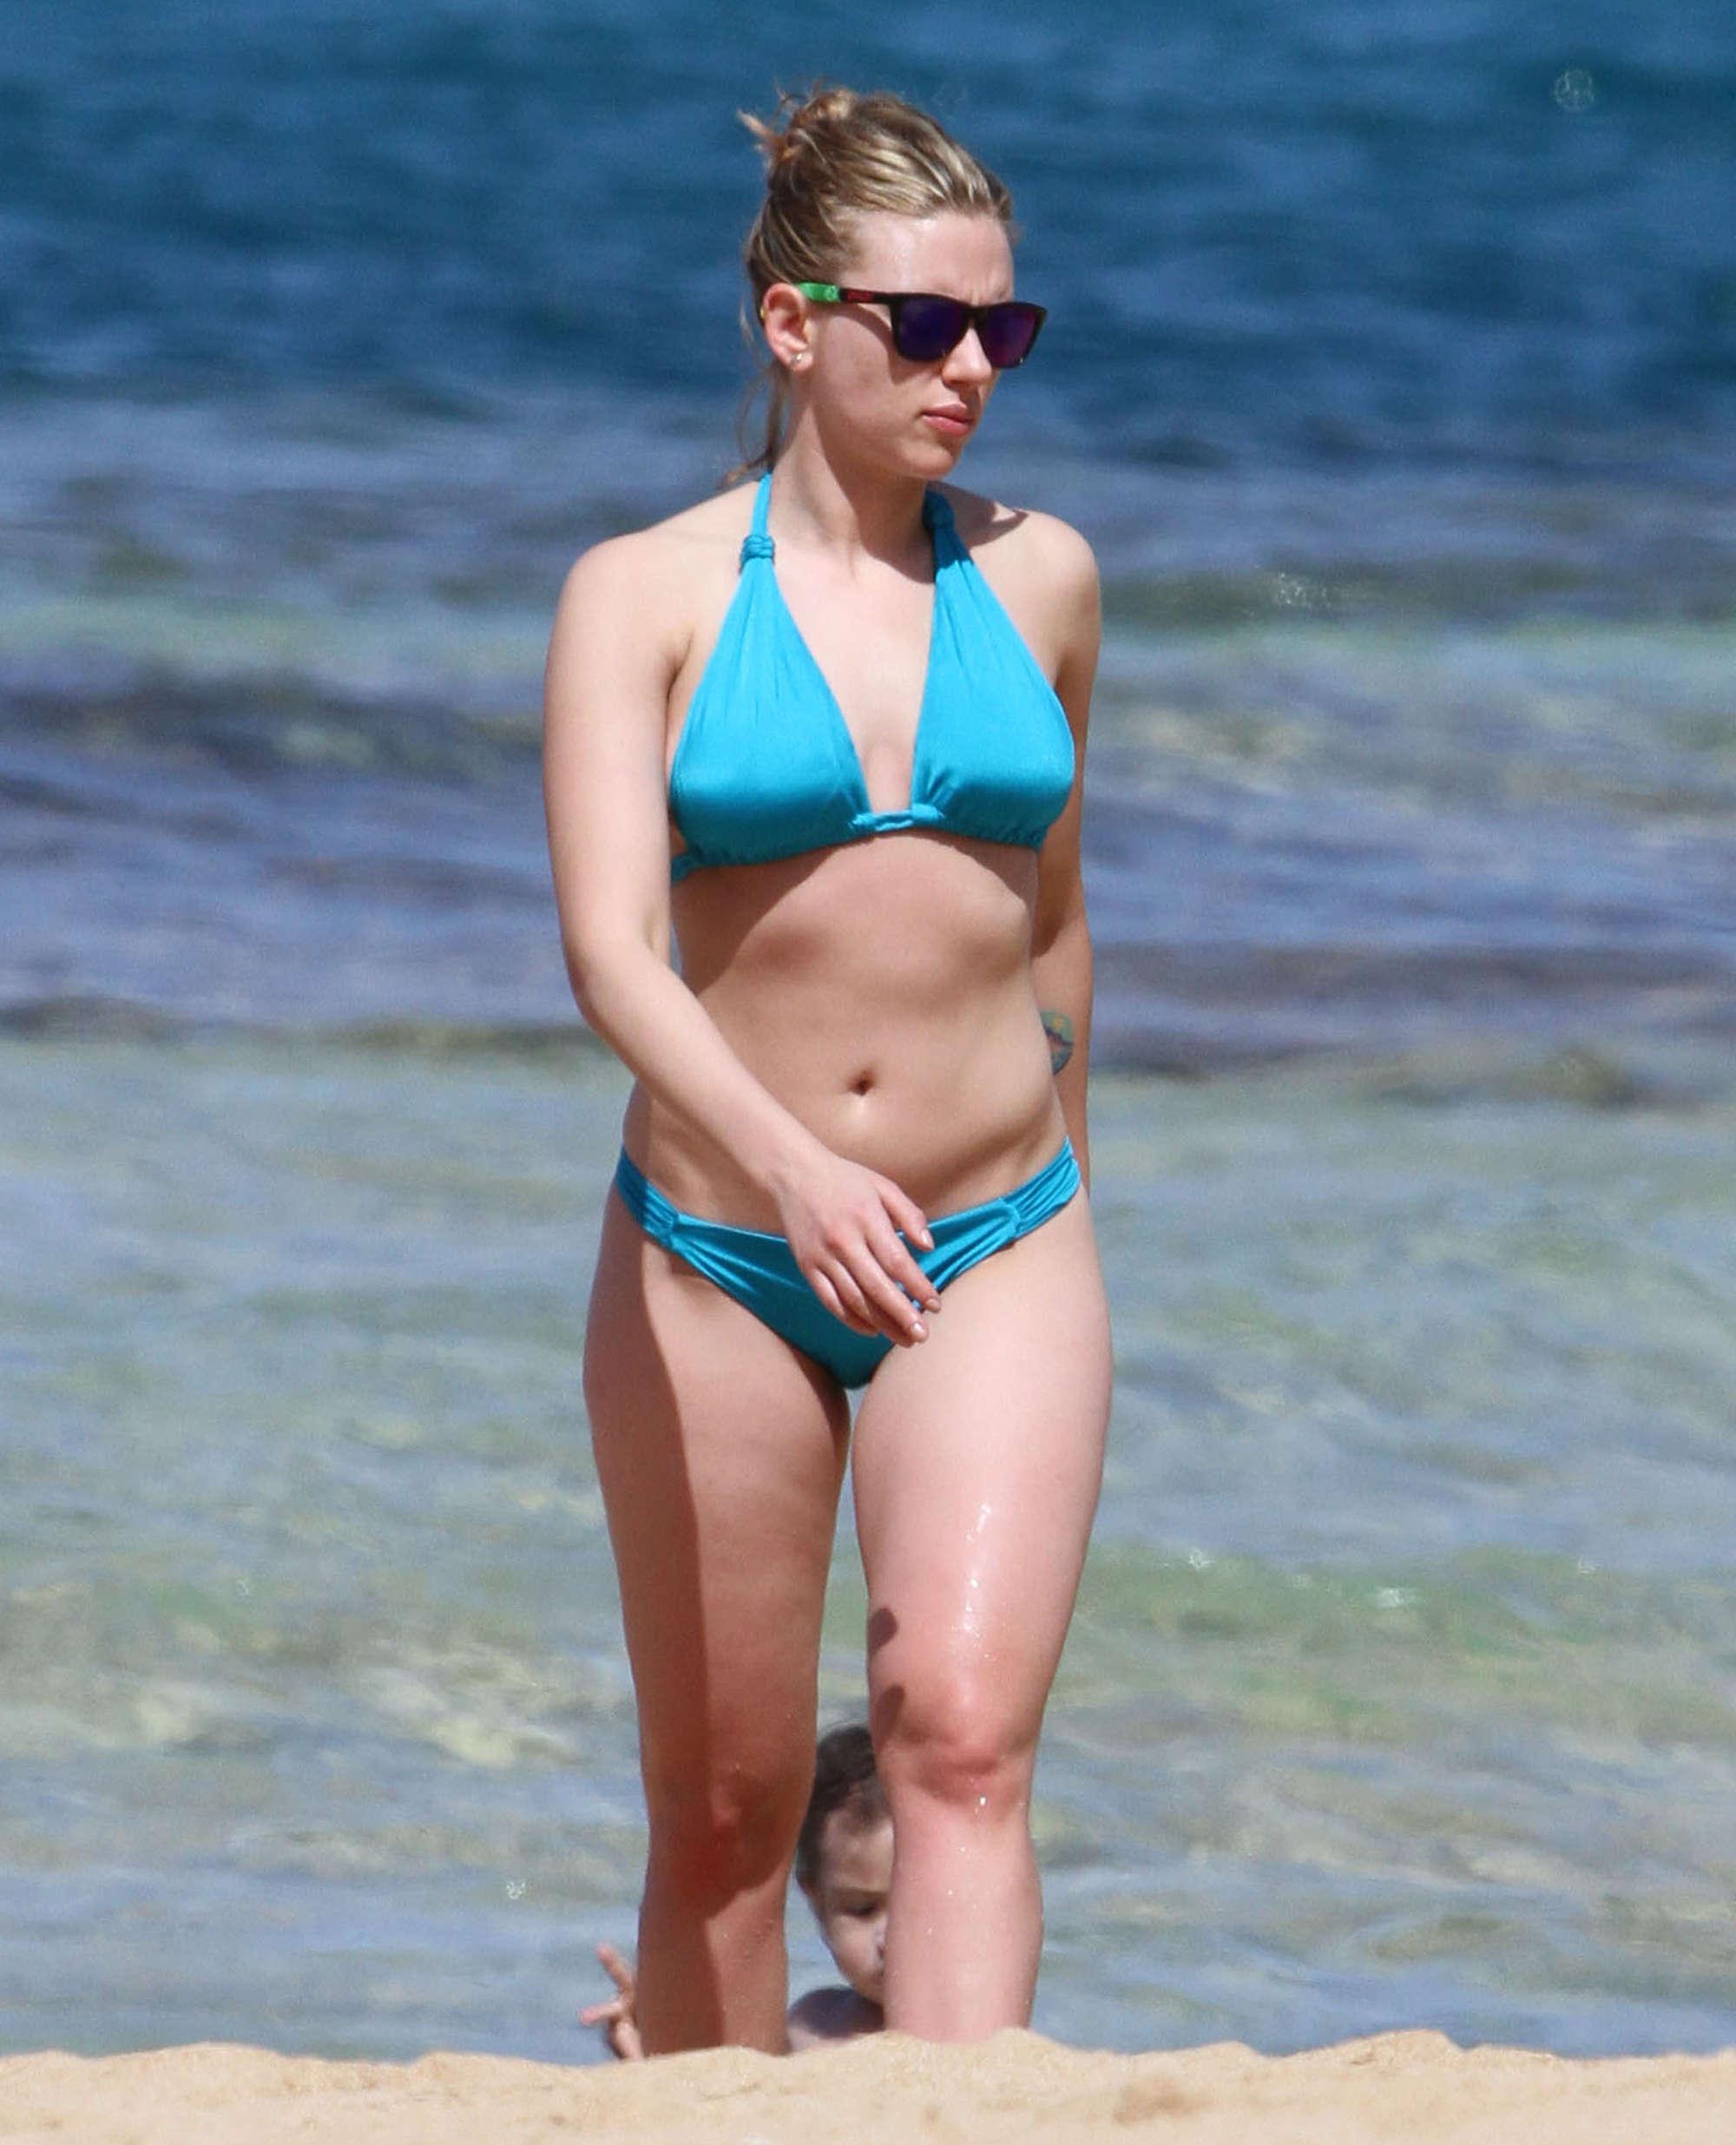 Scarlett Johansson Bikini pics from Hawaii 2012-44 - GotCeleb Maggie Gyllenhaal Diet